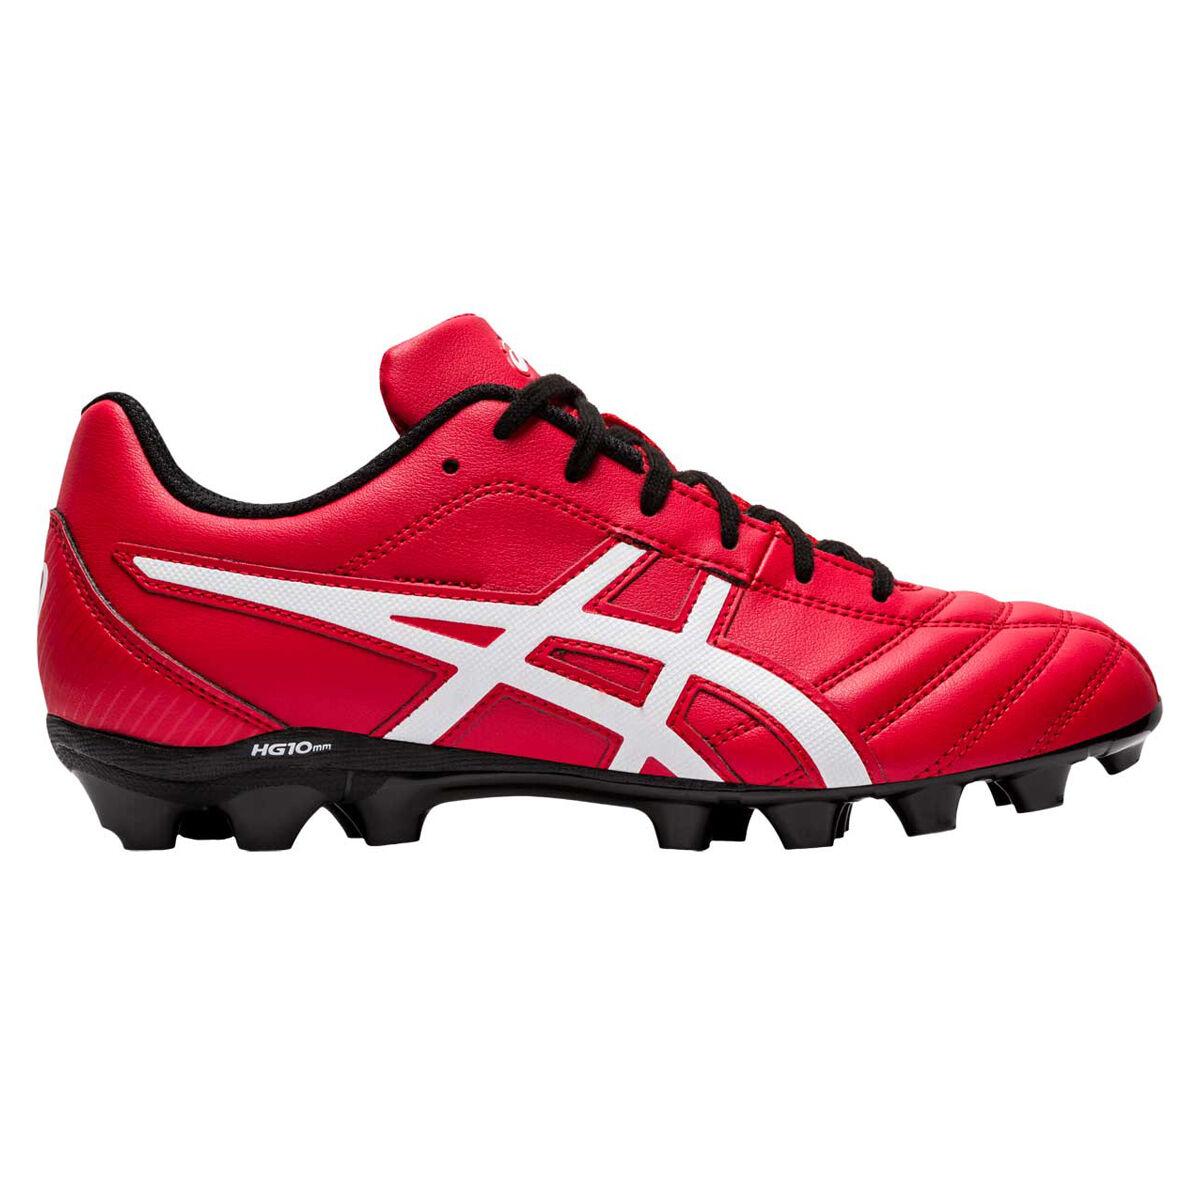 adidas Predator 19.1 Trainer Boost 302 Redirect Footwear WhiteHi Res Red